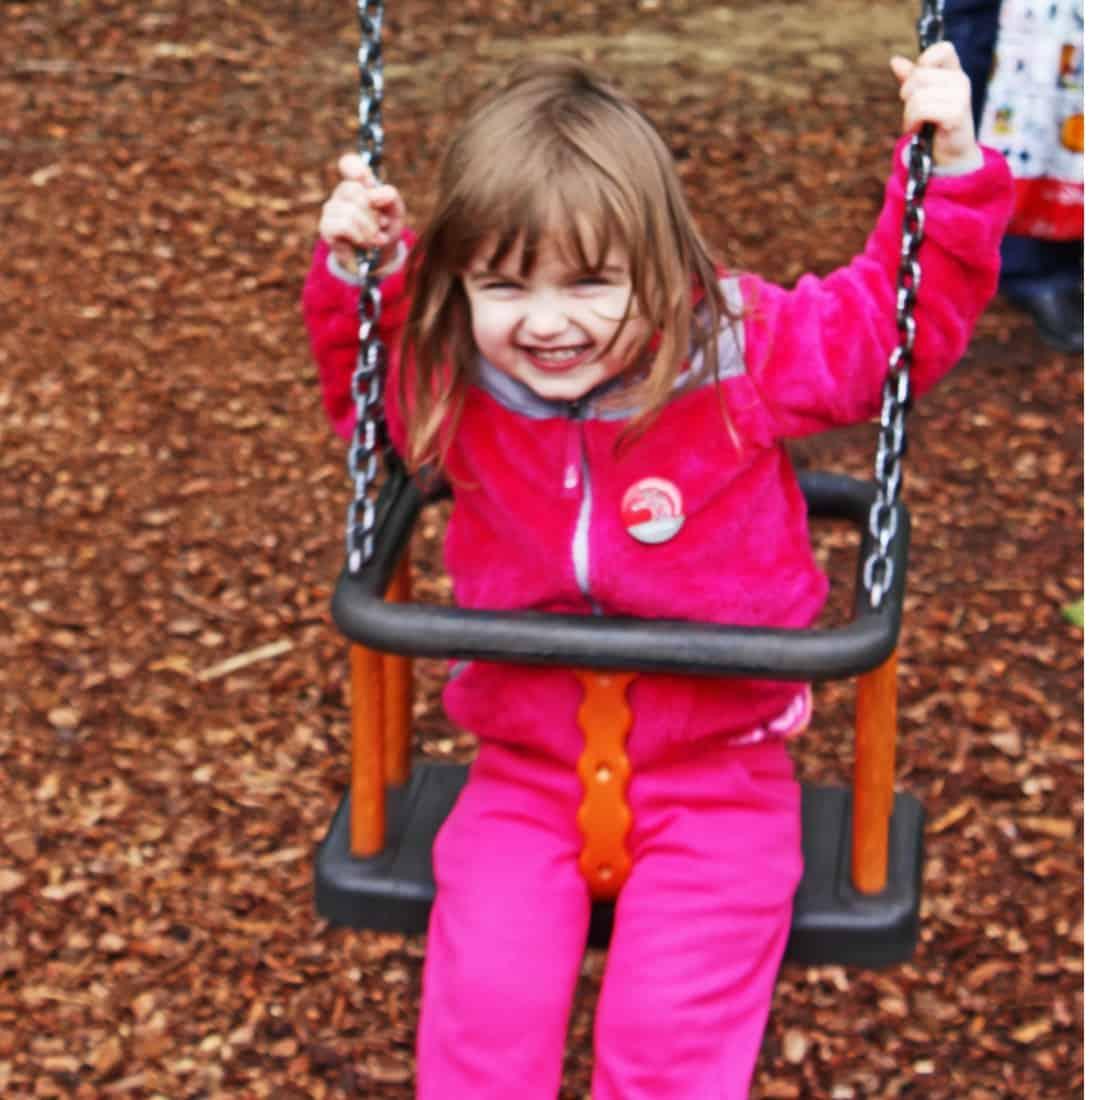 Swinging in Kensington Park - Why I quit Corporate Life